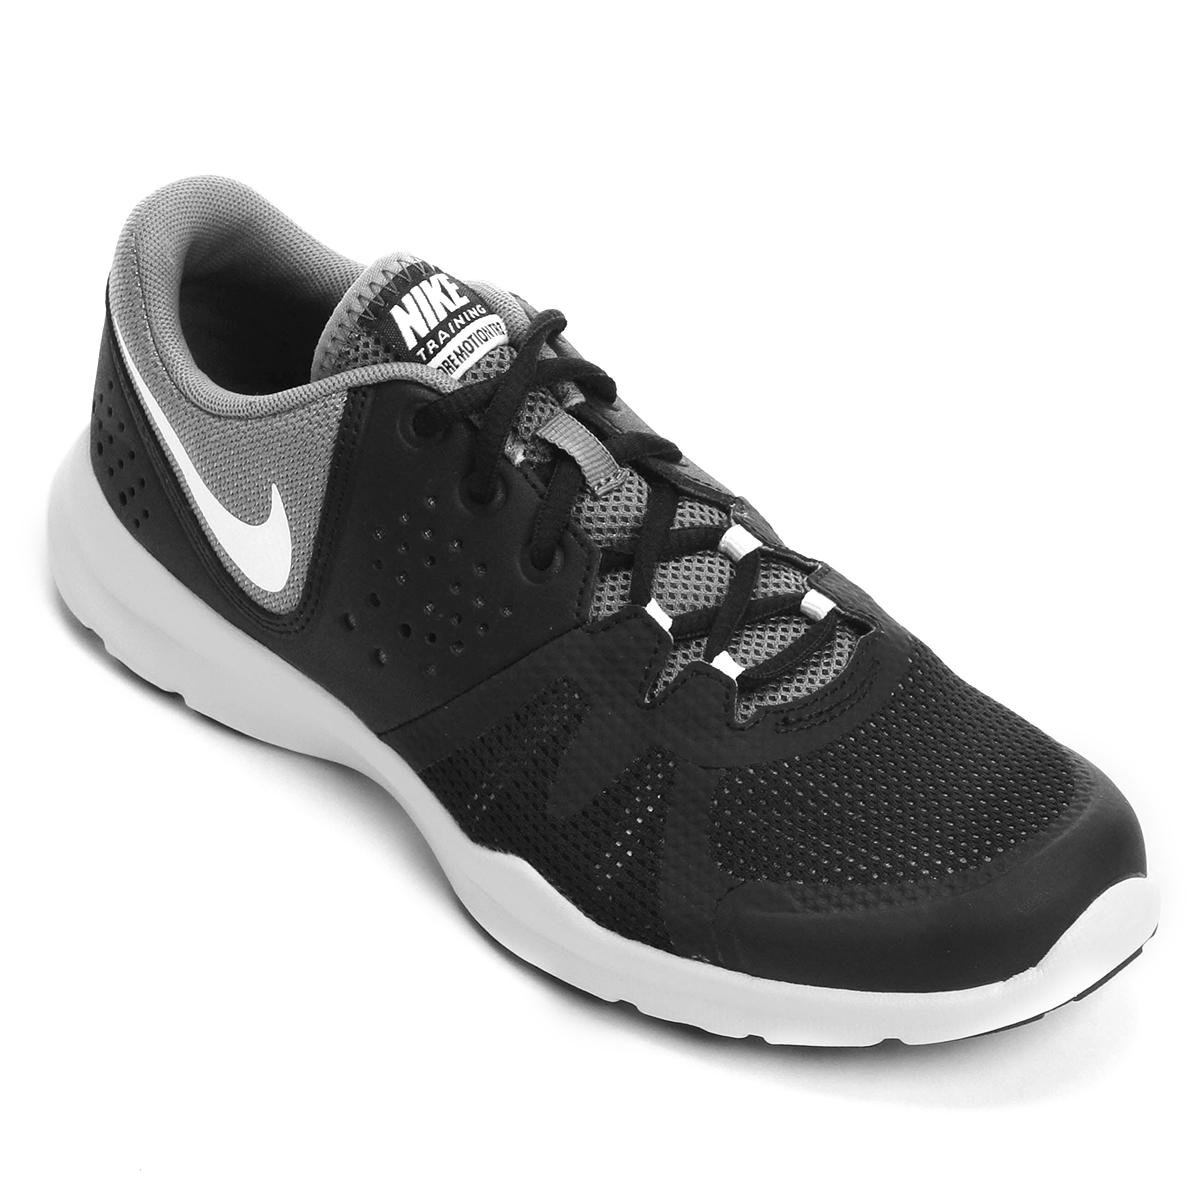 03acfa4f84 Tênis Nike Core Motion Tr 3 Mesh Feminino - Compre Agora